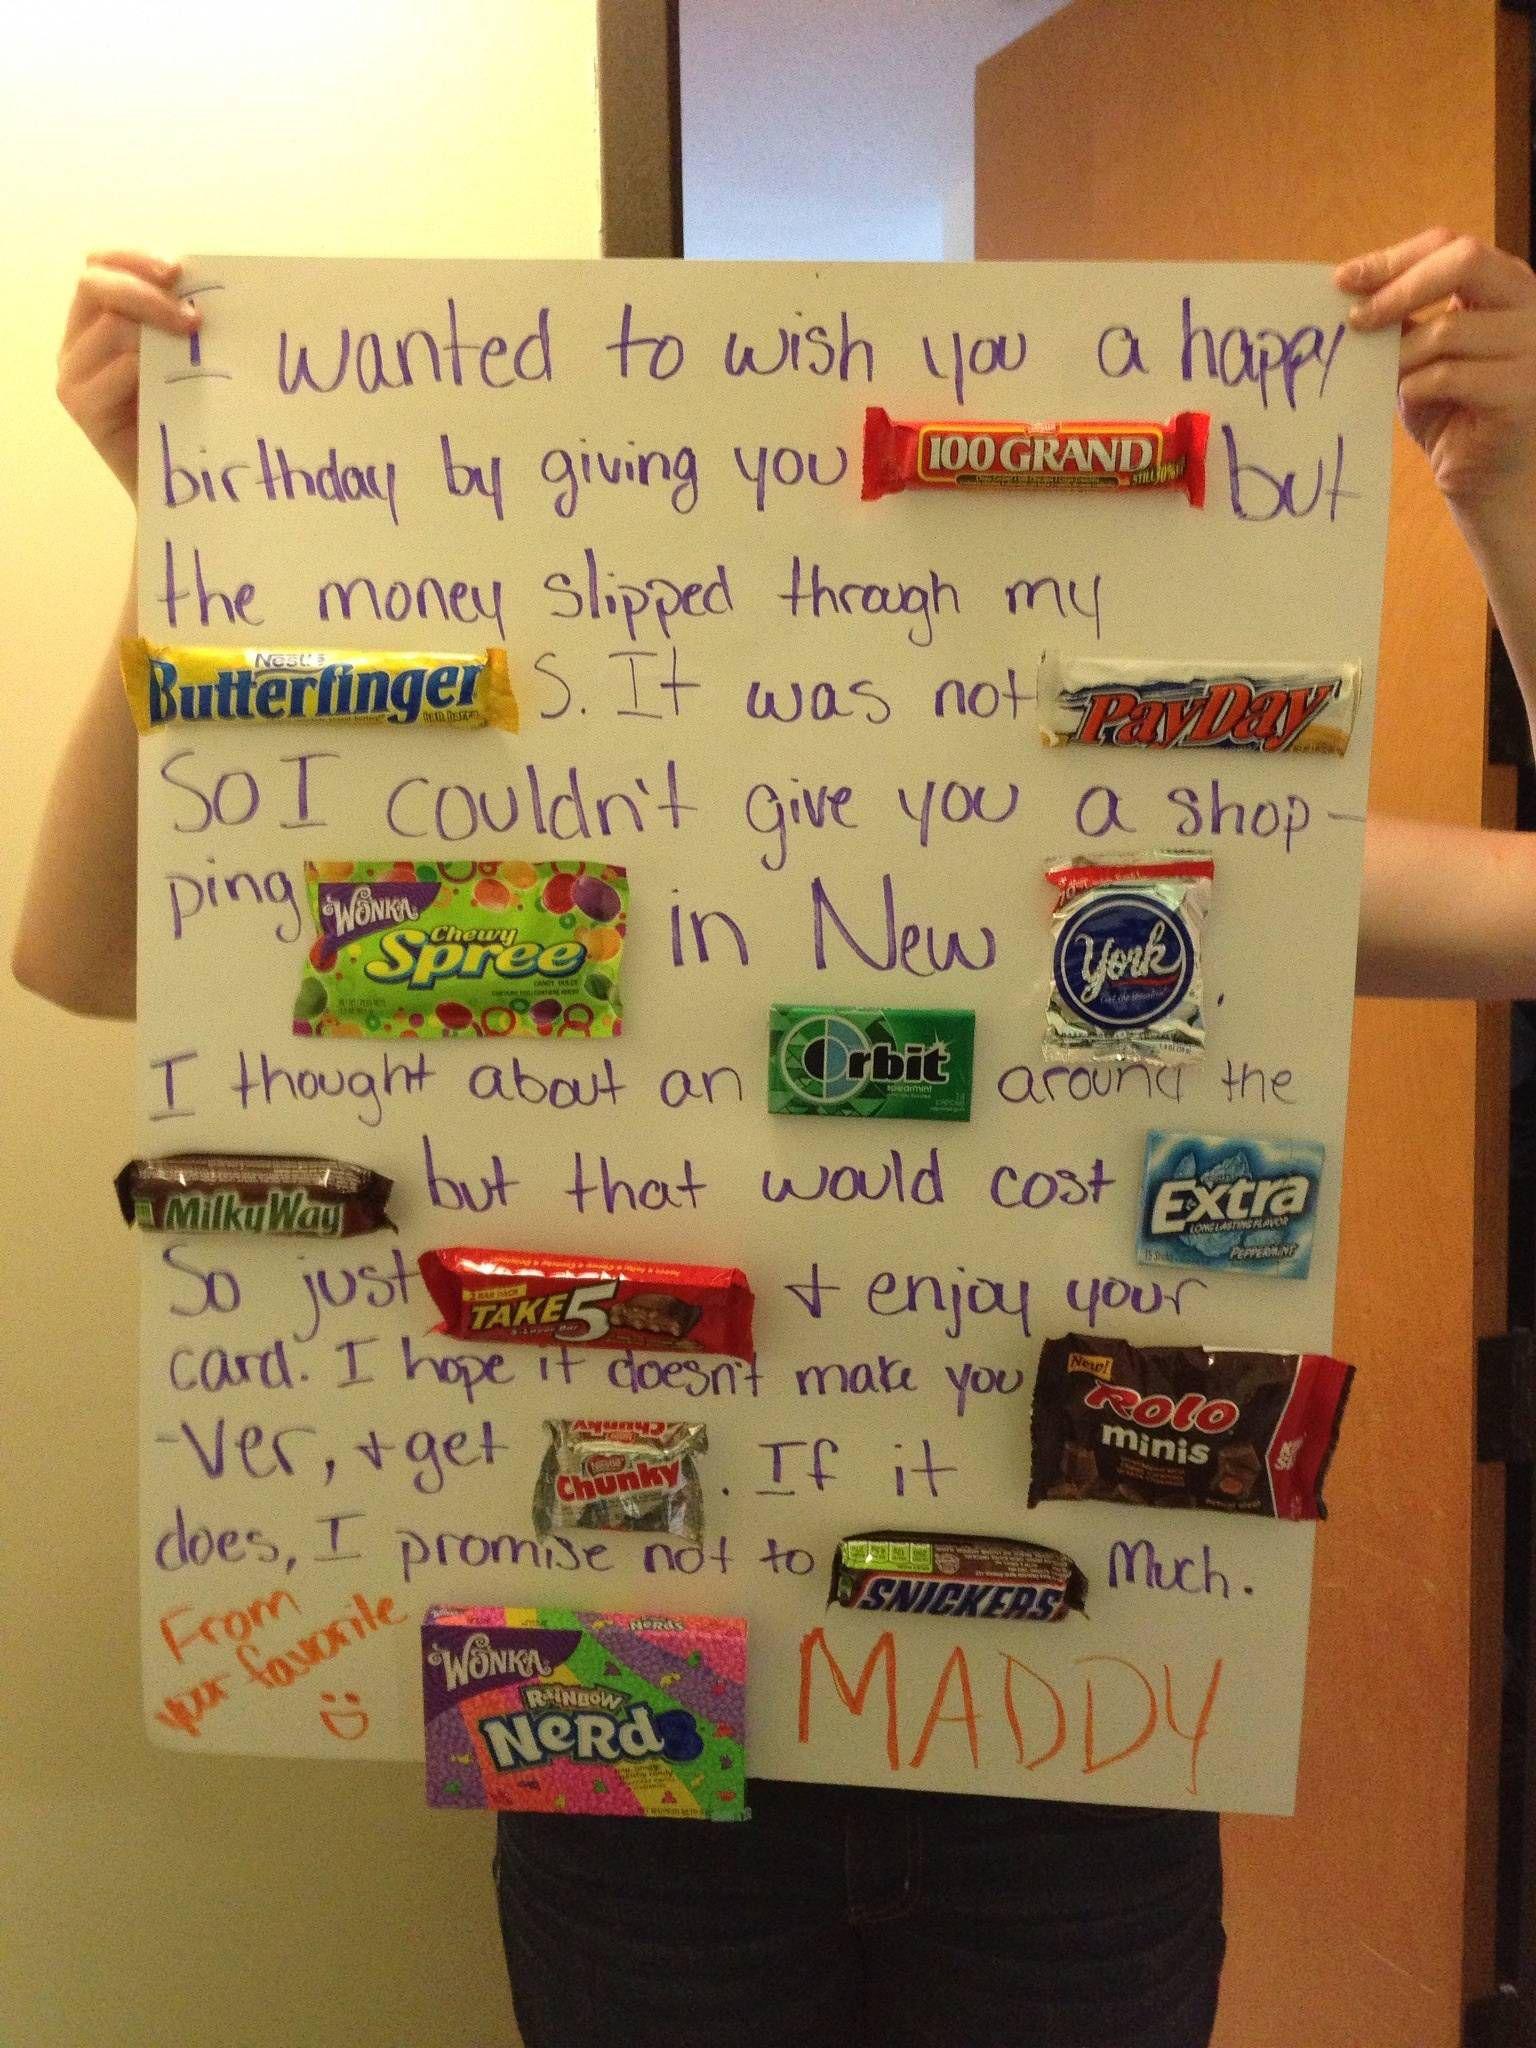 My Birthday Card From My Best Friend Imgdonkey Diy Friend Gift Candy Bars Birthday